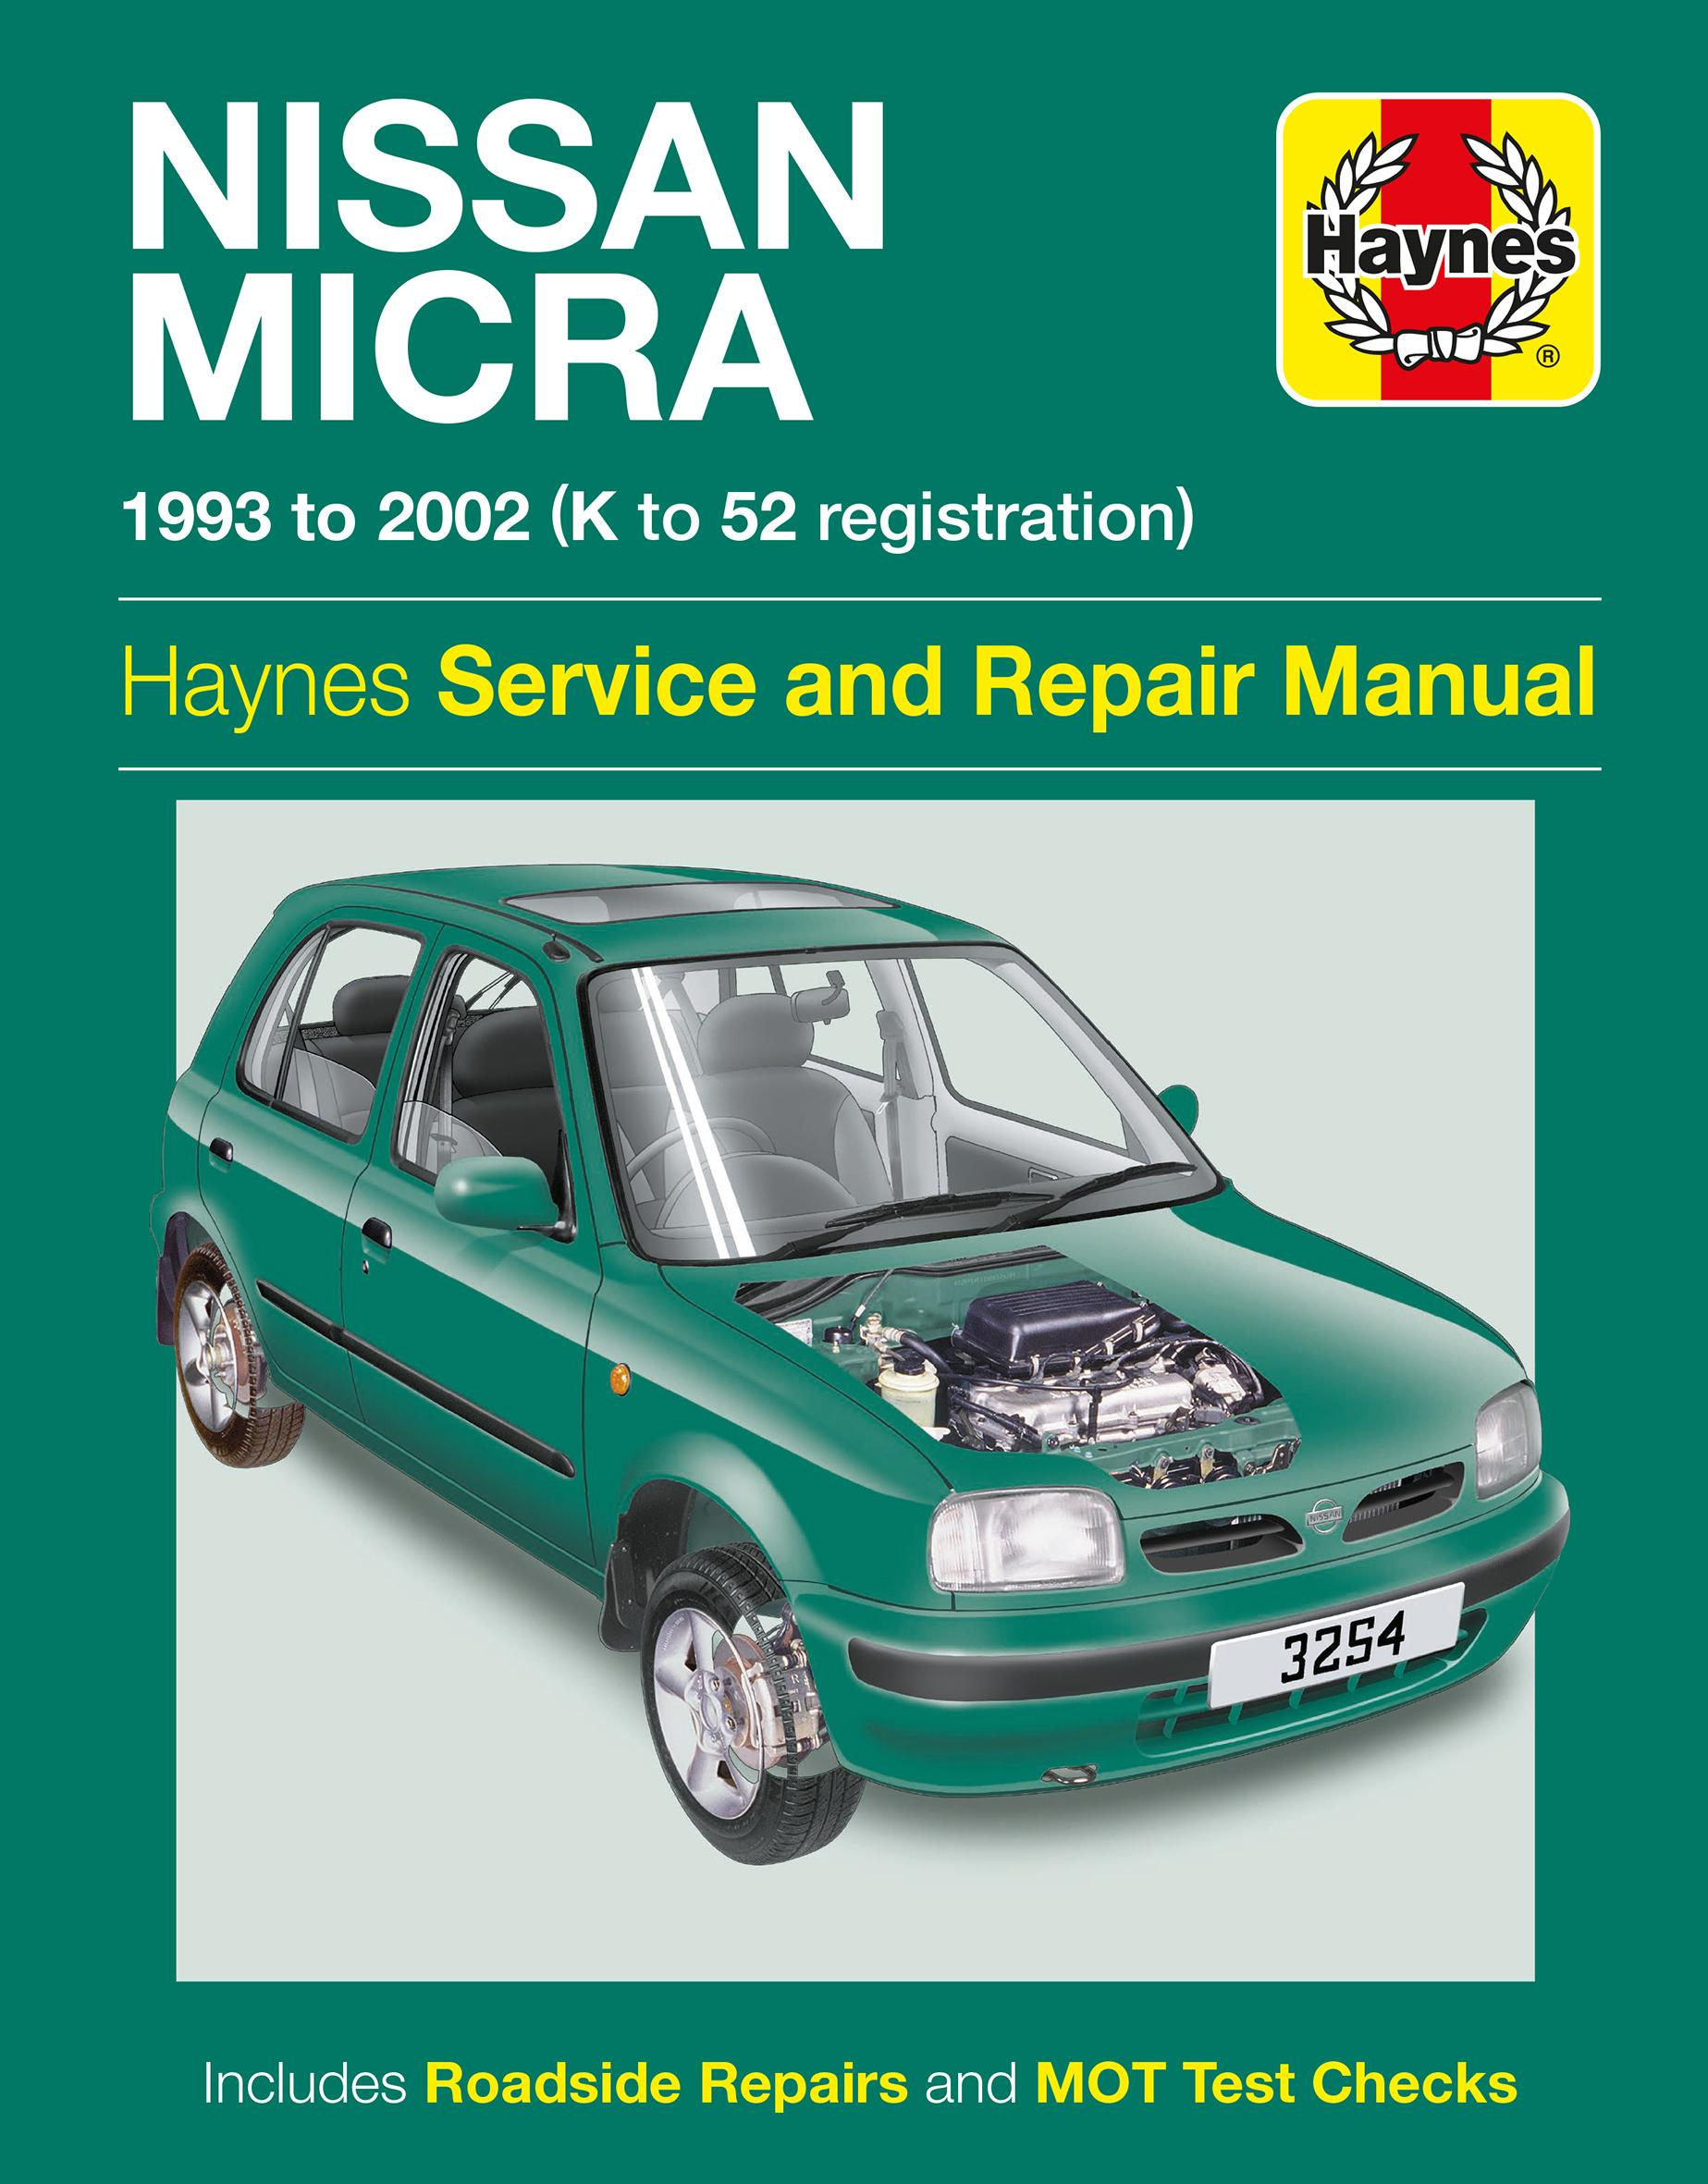 haynes nissan micra 93 02 manua rh halfords com nissan micra workshop manual k11 nissan micra k11 repair manual free download